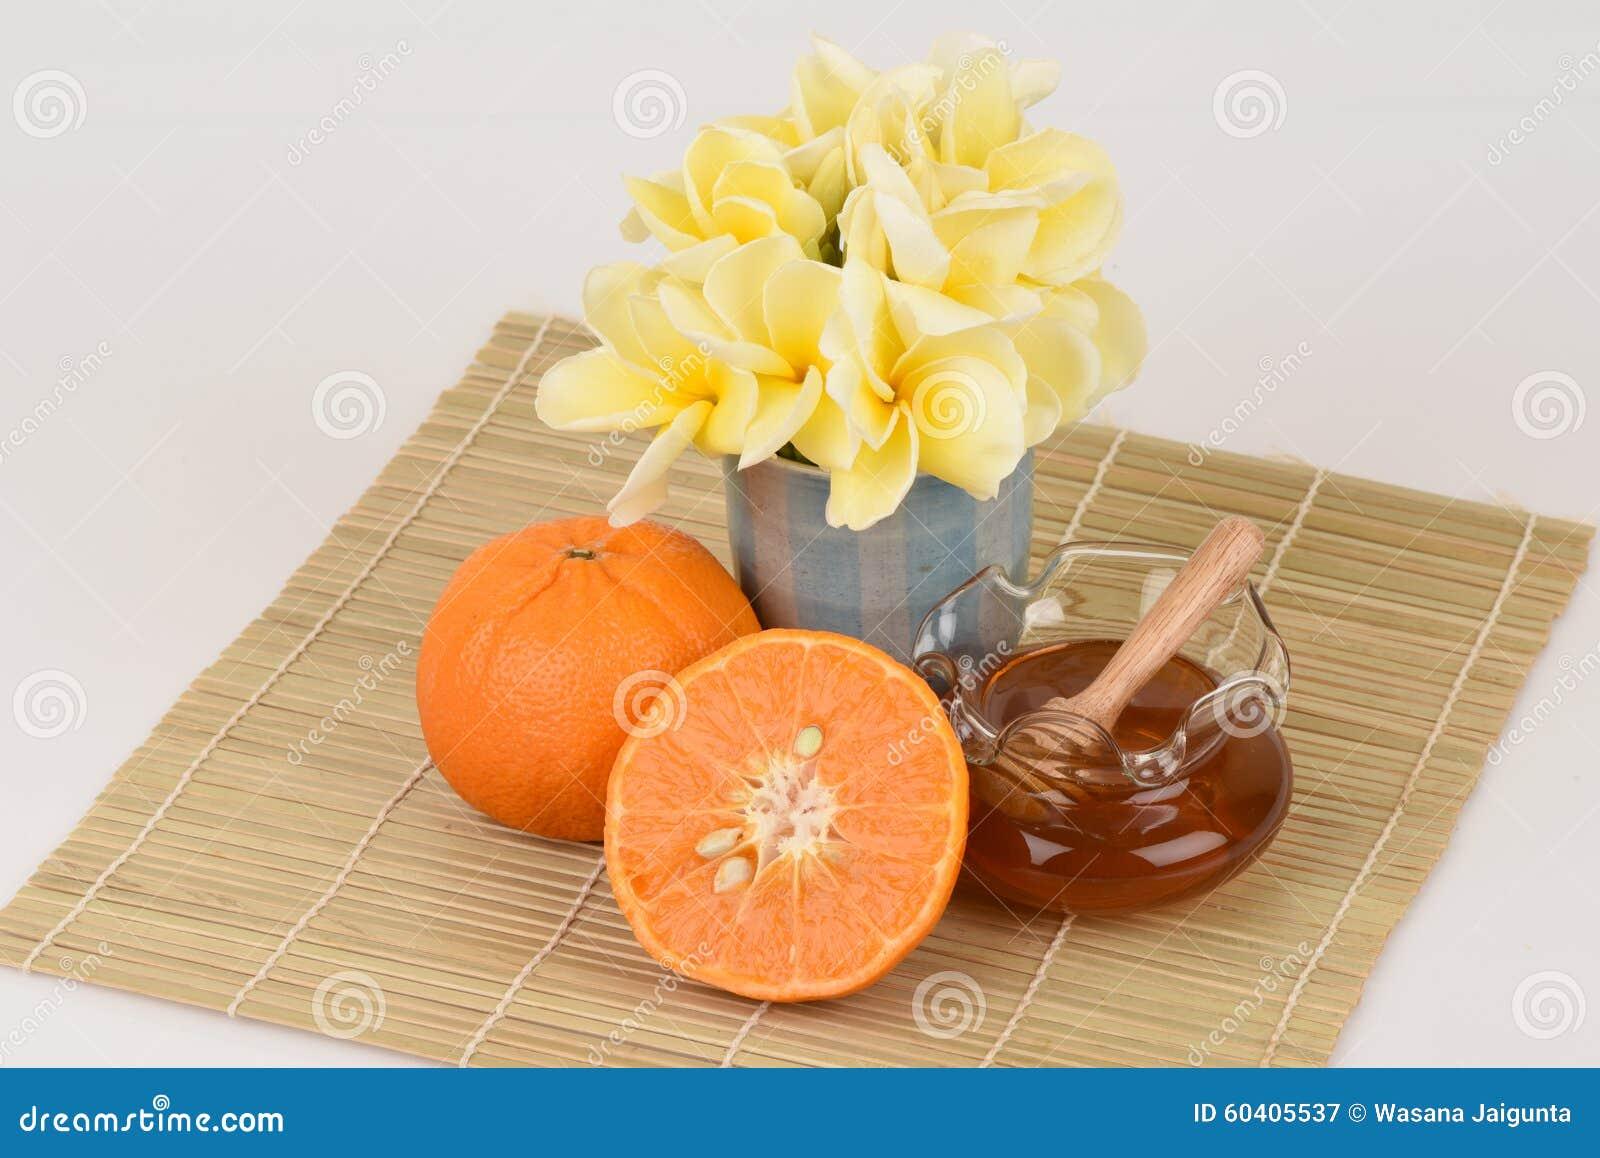 Máscara protetora com laranja e mel